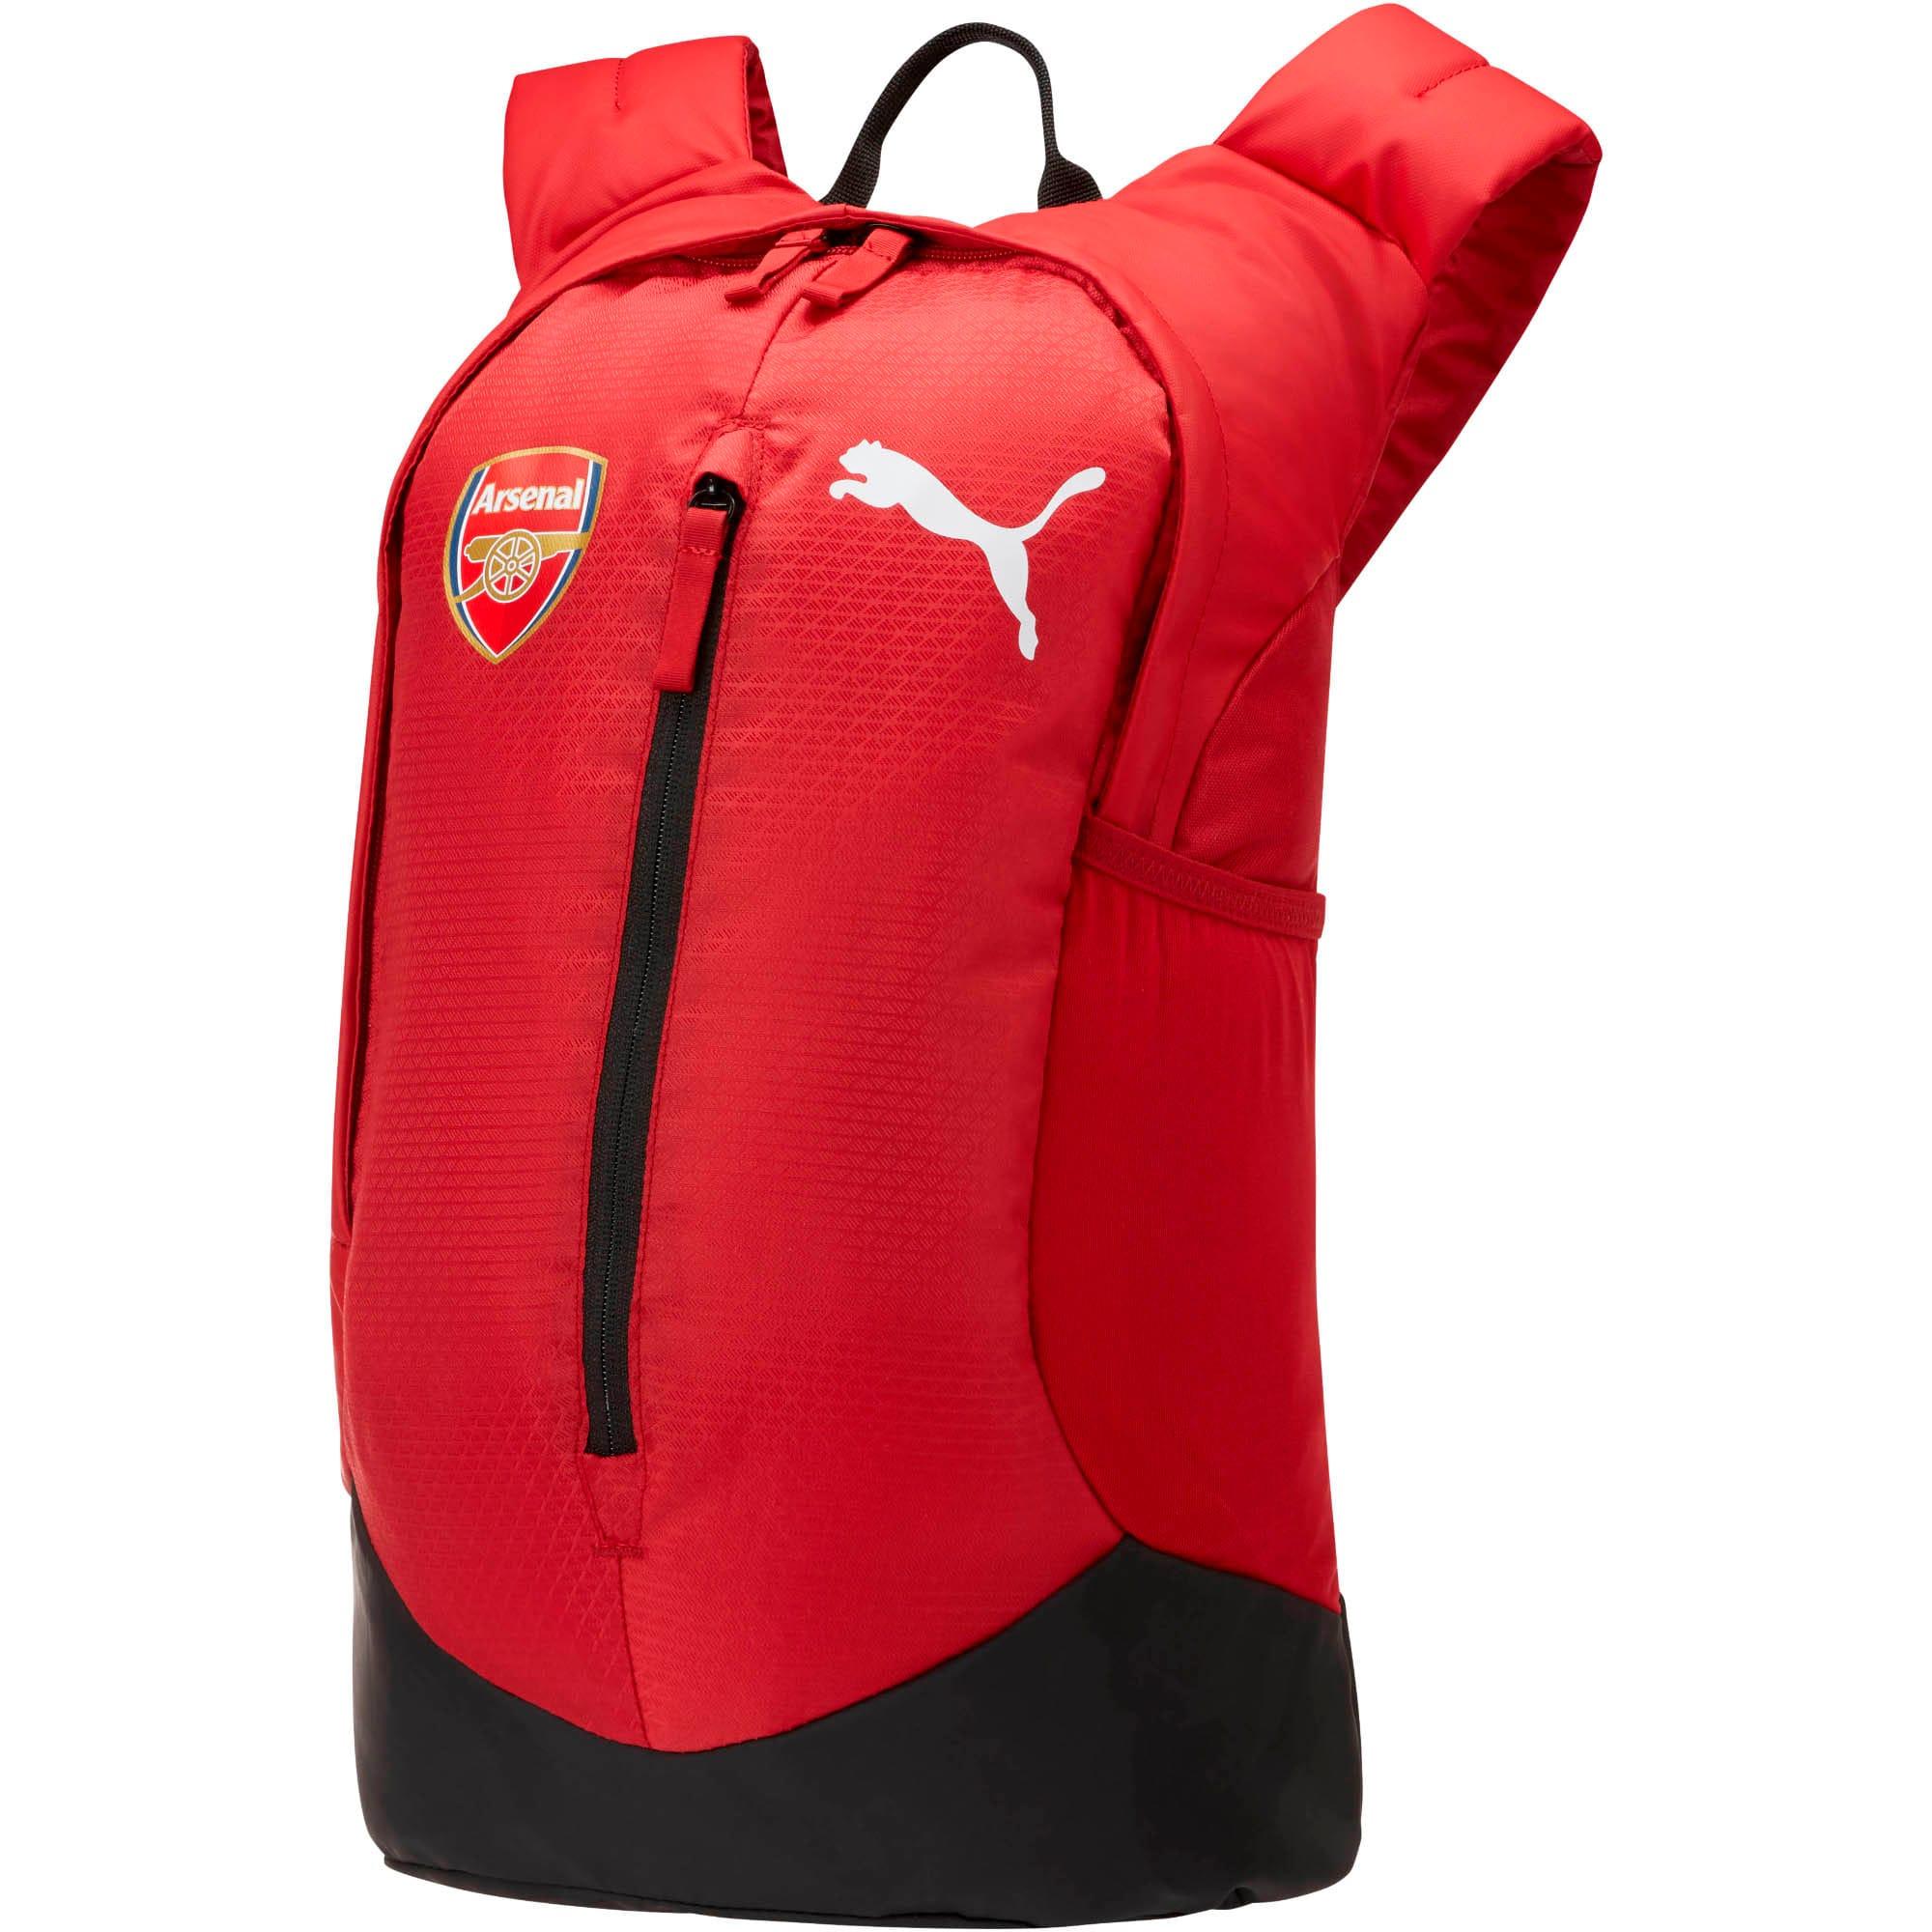 Thumbnail 1 of Arsenal Performance Backpack, Chili Pepper-Red-Black, medium